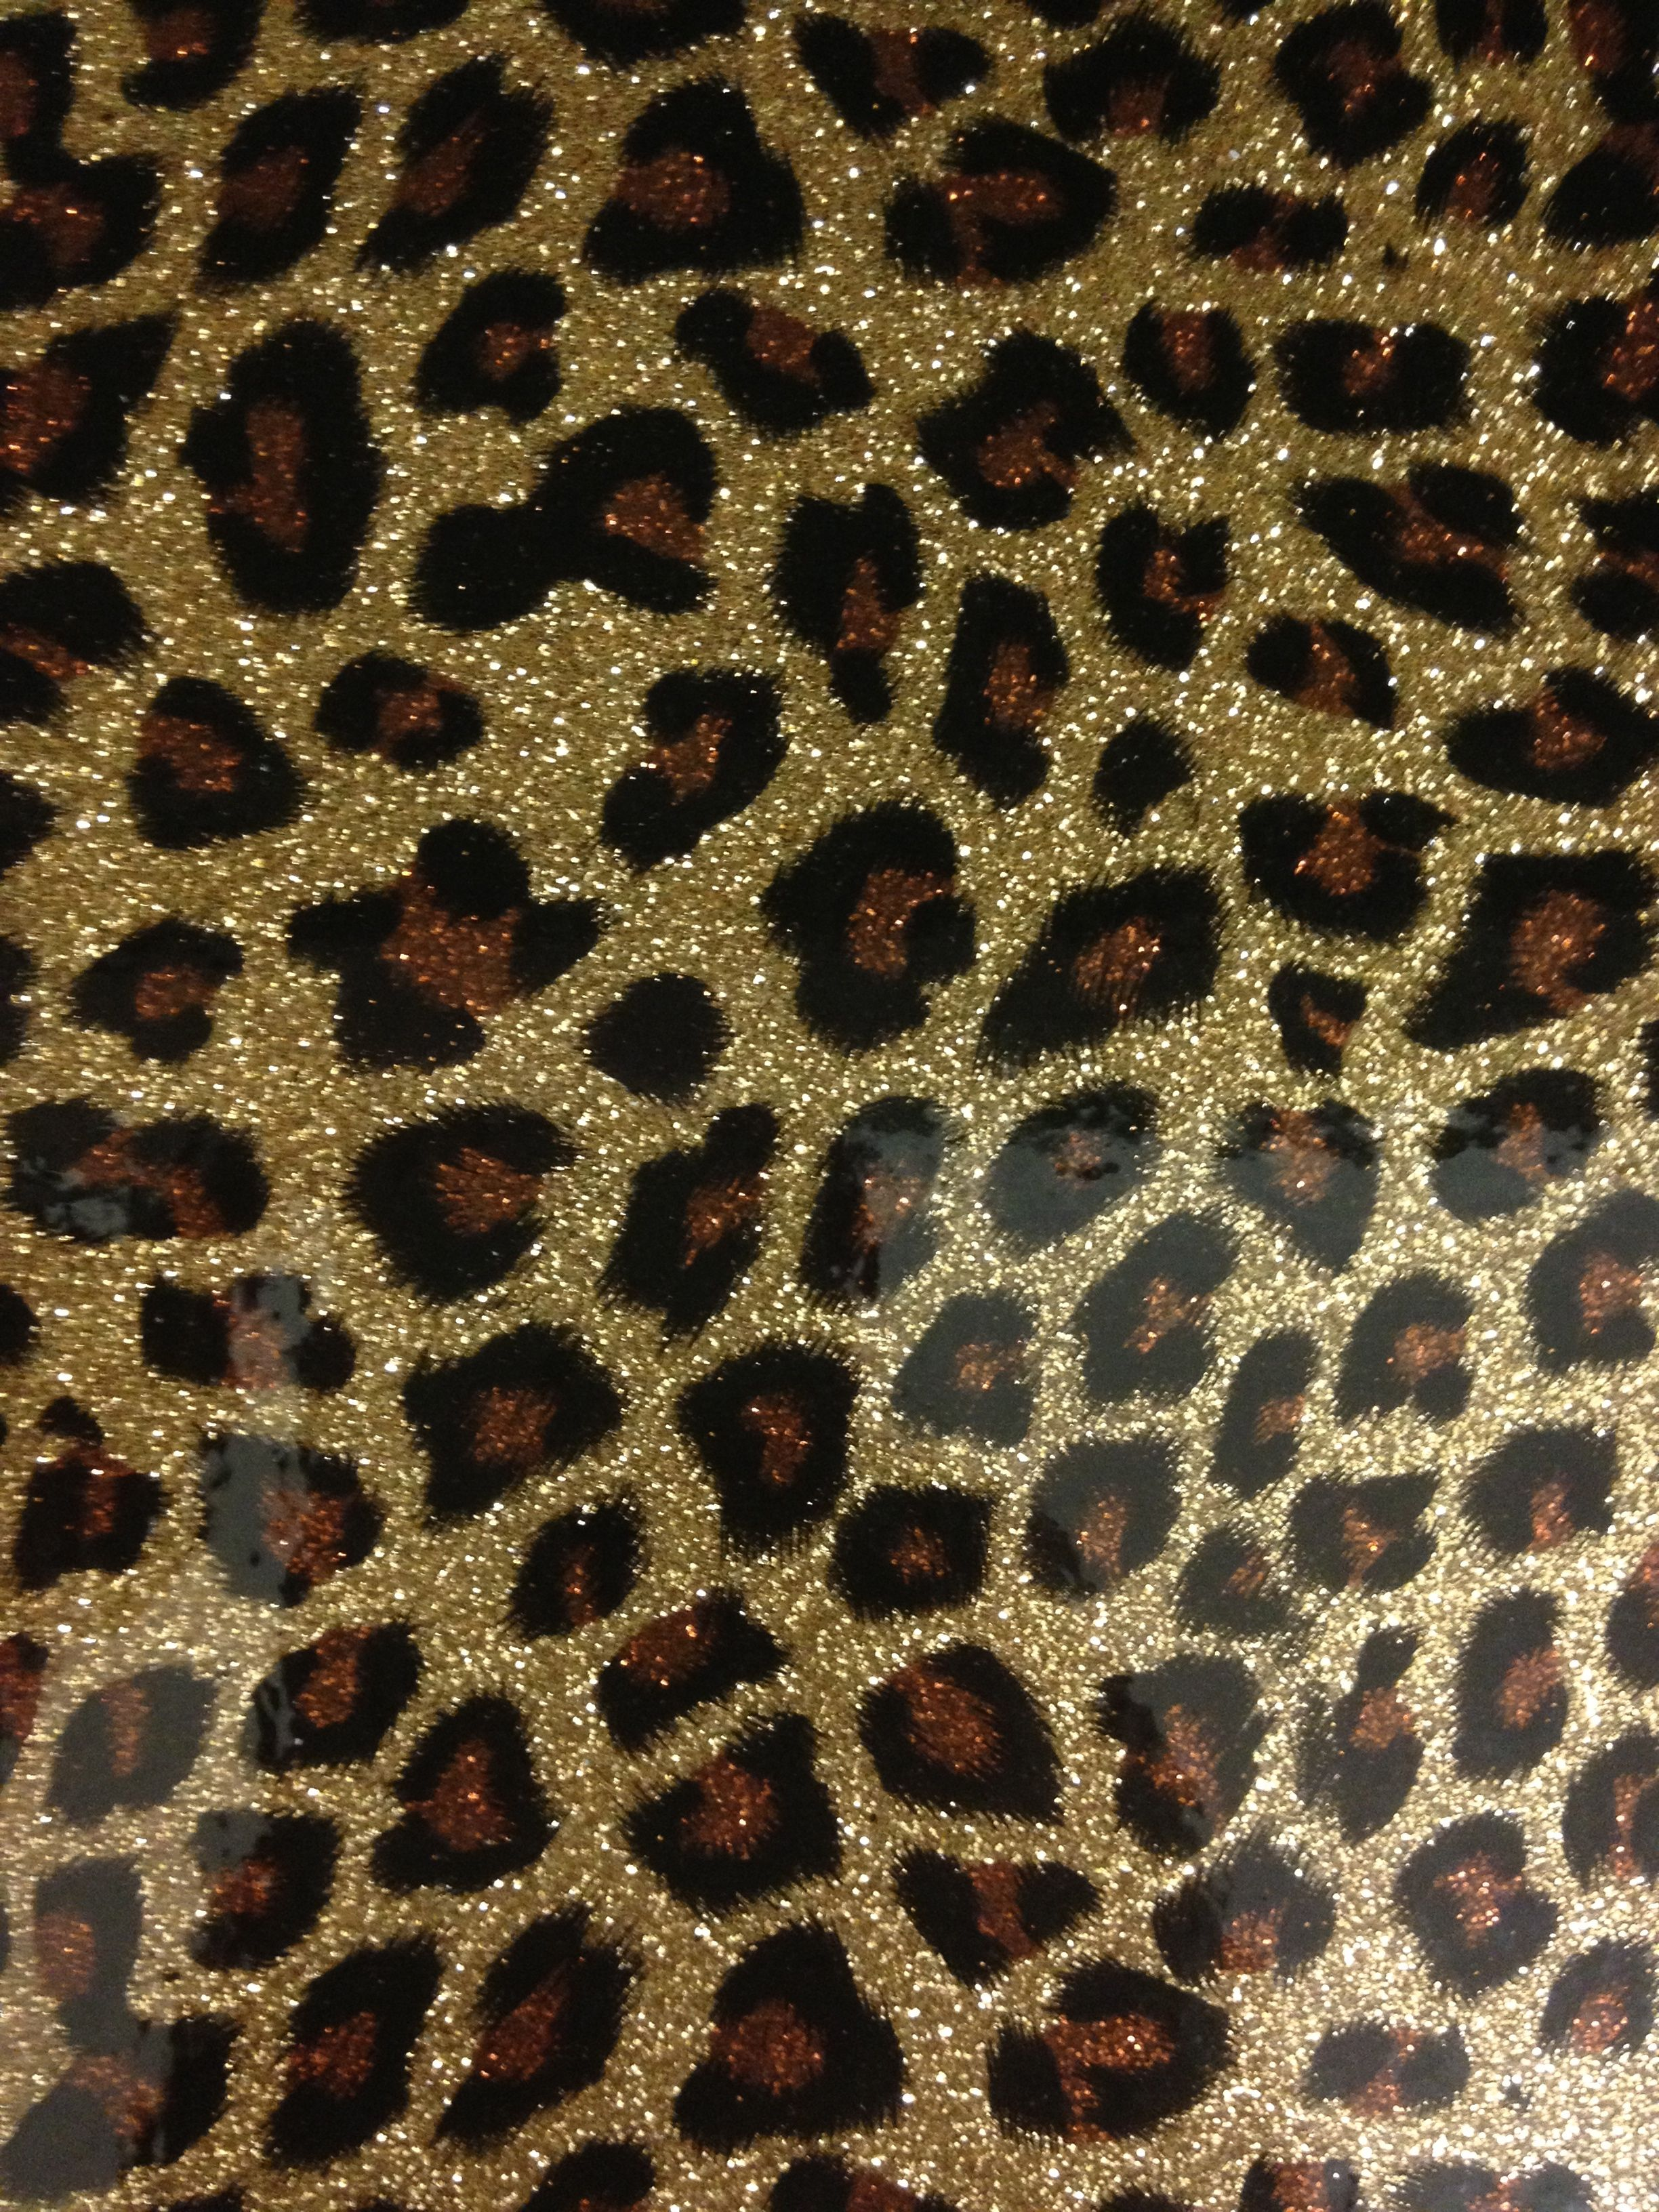 Leopard Print Wallpaper Bedroom Black Brown Gold Leopard Print Glitter Graphic Designss